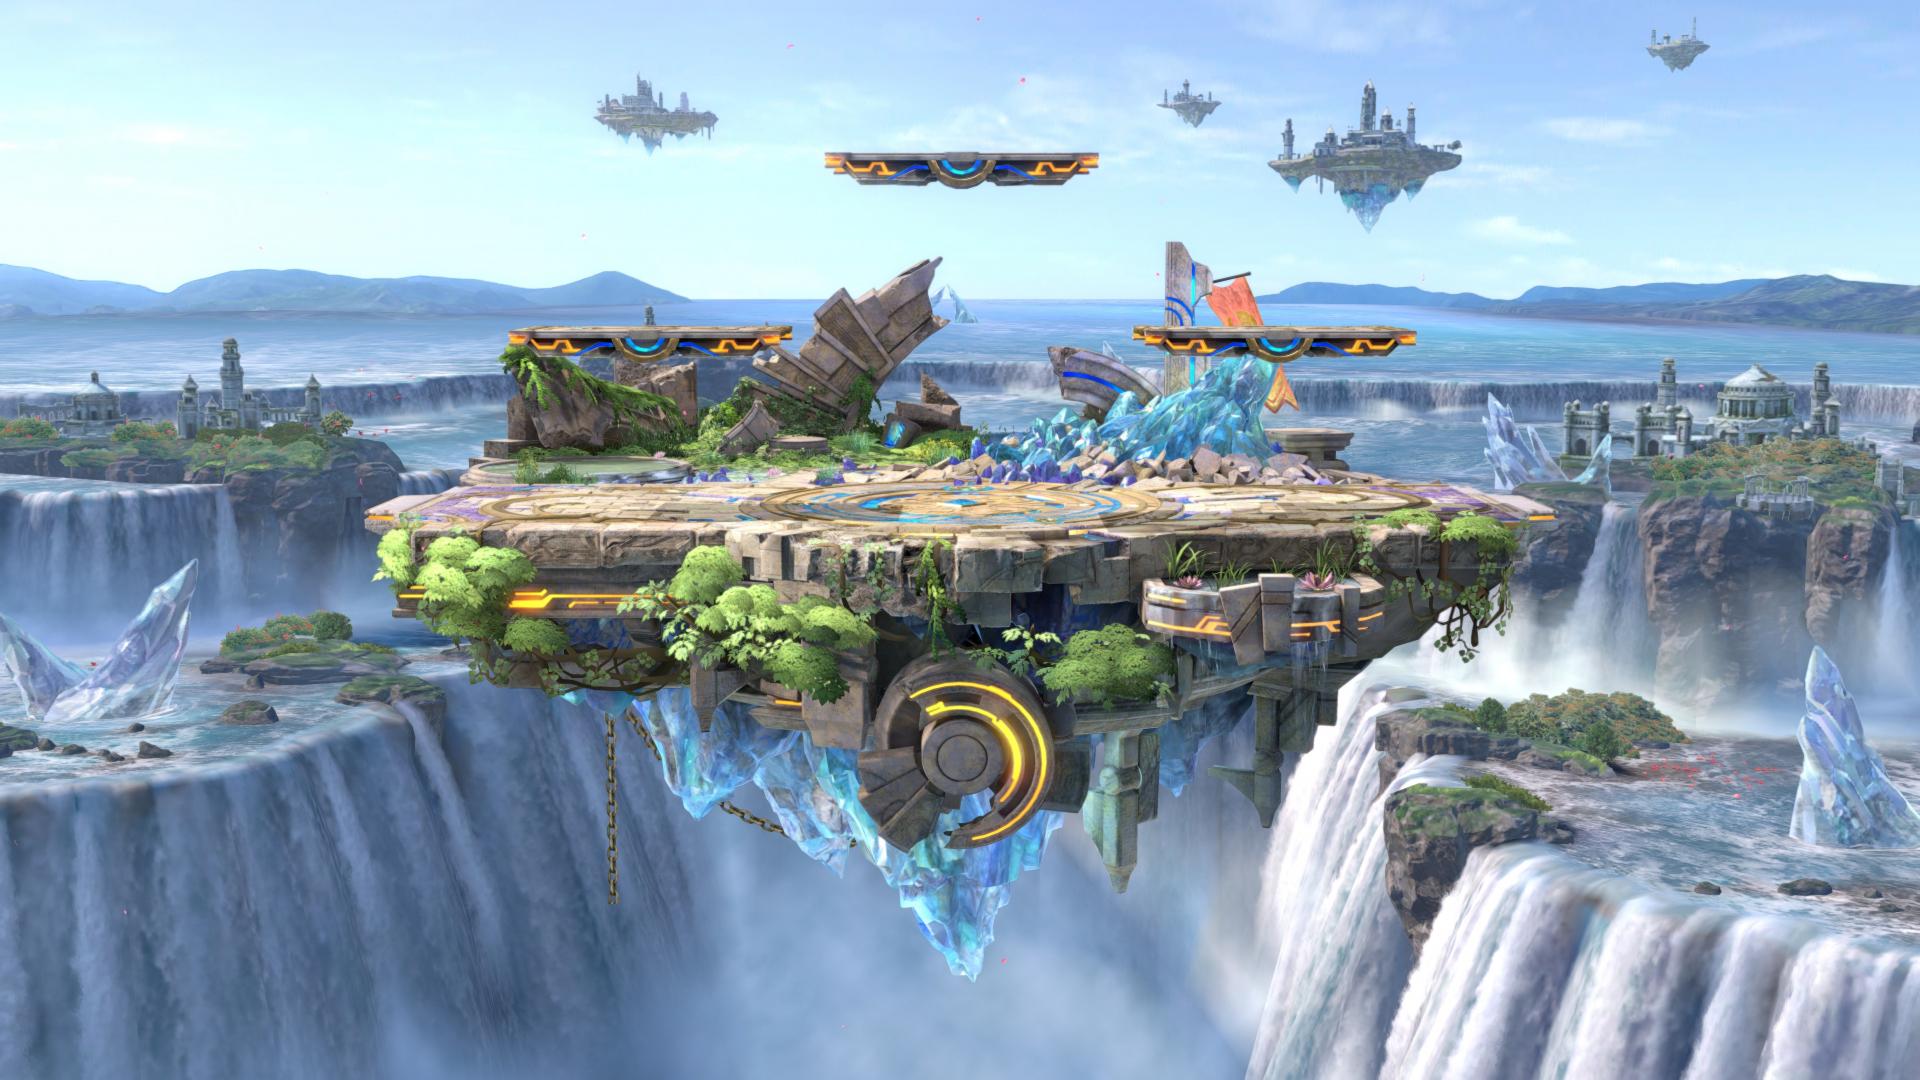 Download 1920x1080 Wallpaper Super Smash Bros Ultimate Video